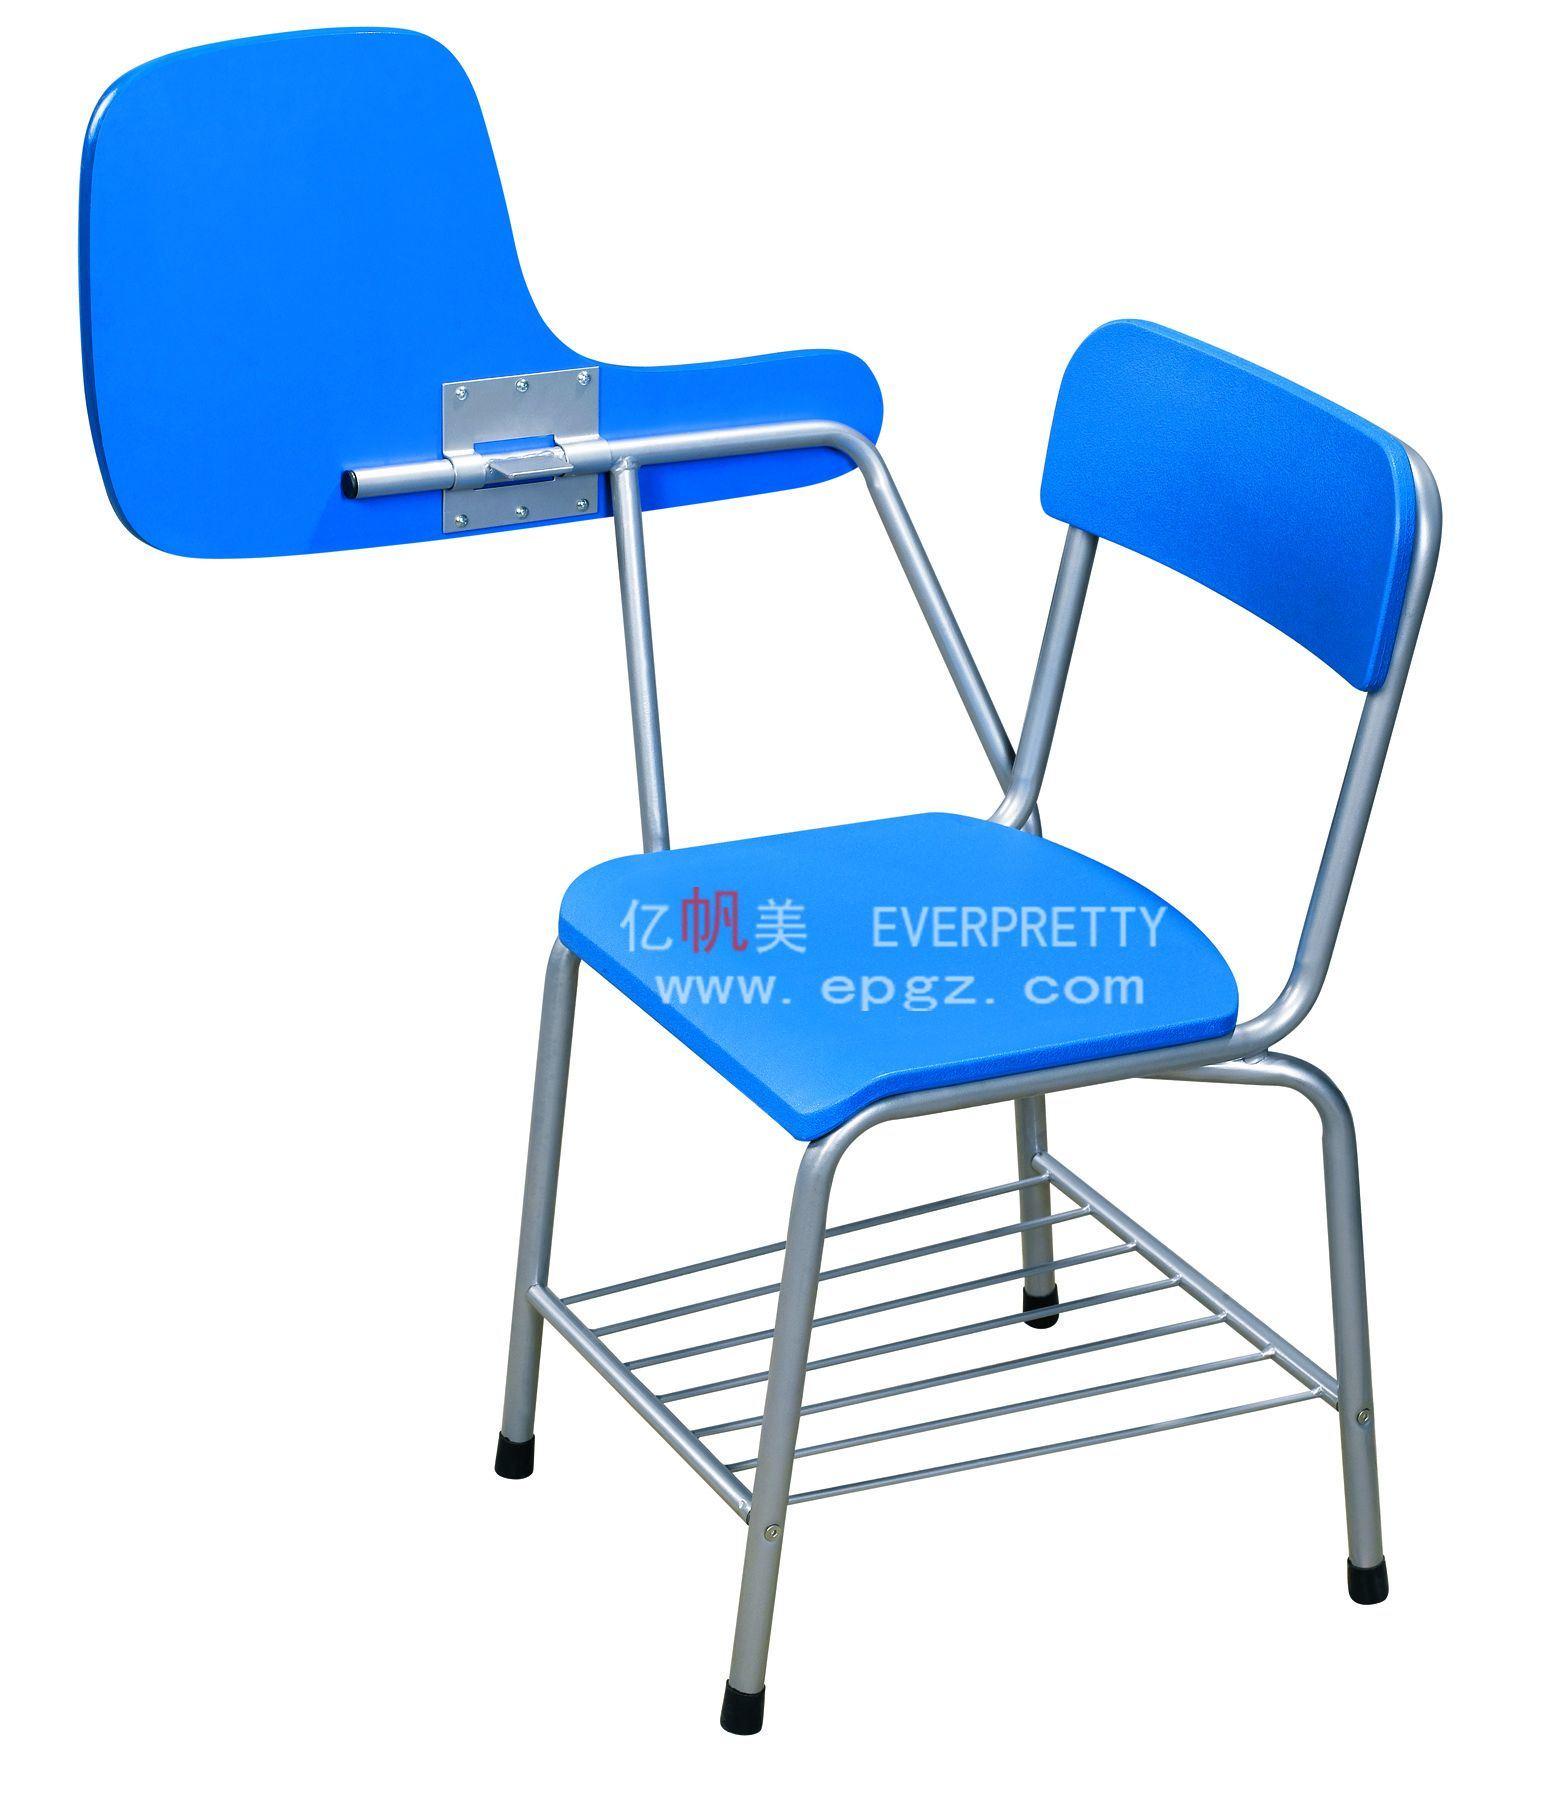 Student Chair Guangzhou Everpretty Furniture Co Ltd page 3